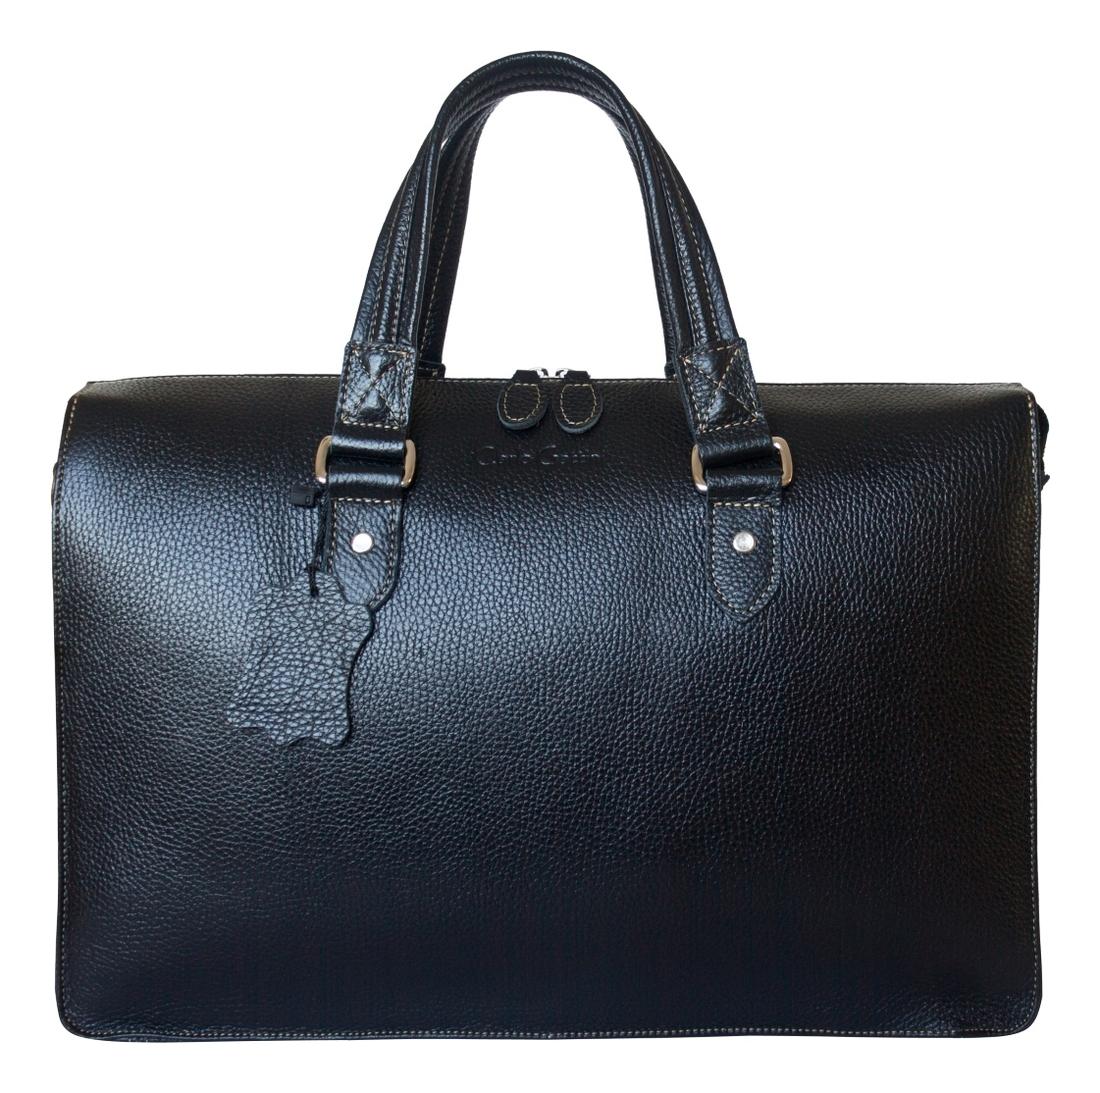 Купить Сумка для ноутбука Riofreddo Black 1029-01, Carlo Gattini